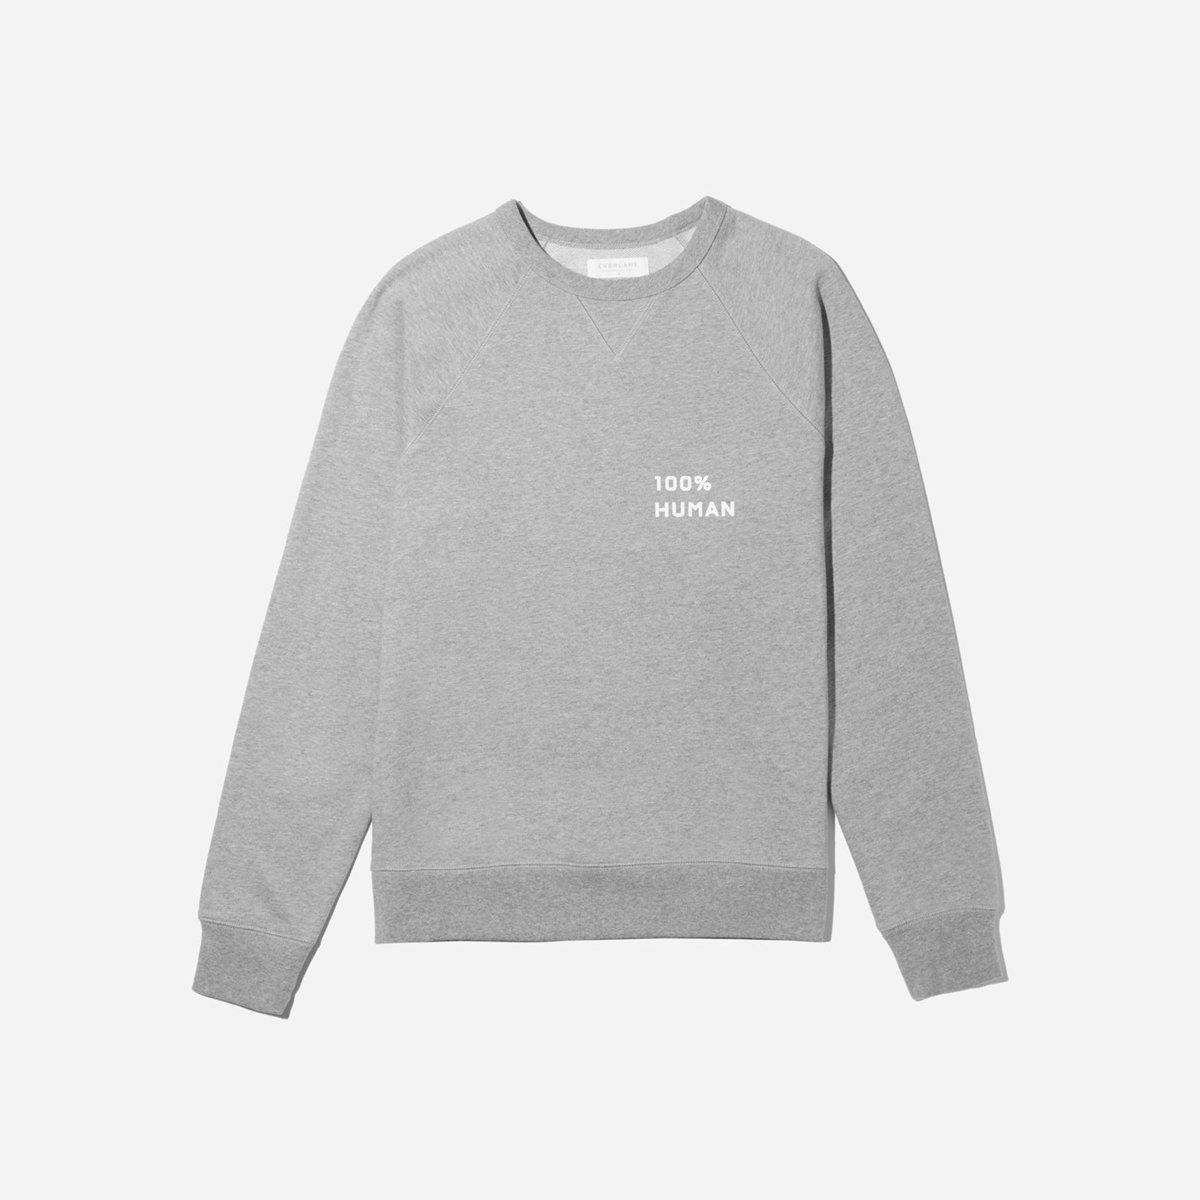 Everlane 100% Human sweatshirt.jpg